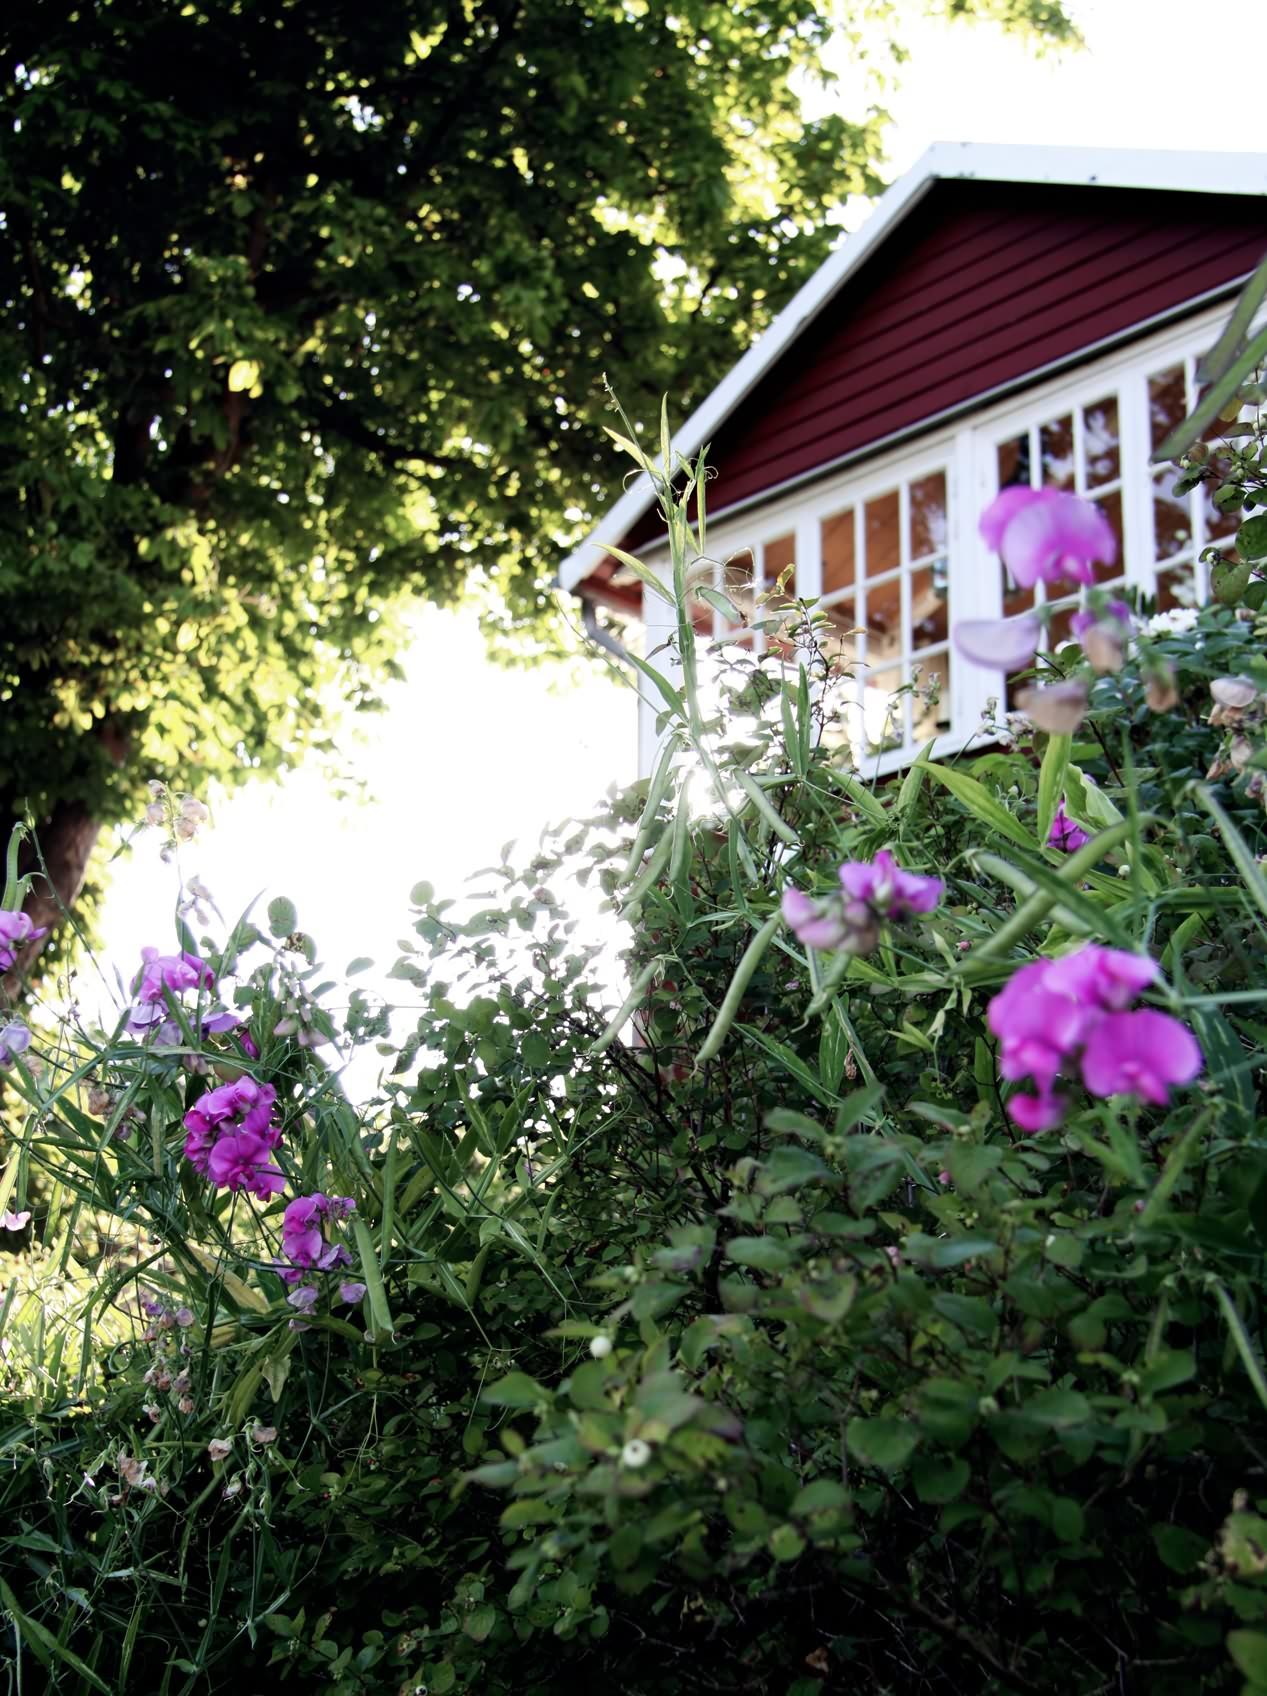 IMG_6934_Citadellet_blommor_hus_web